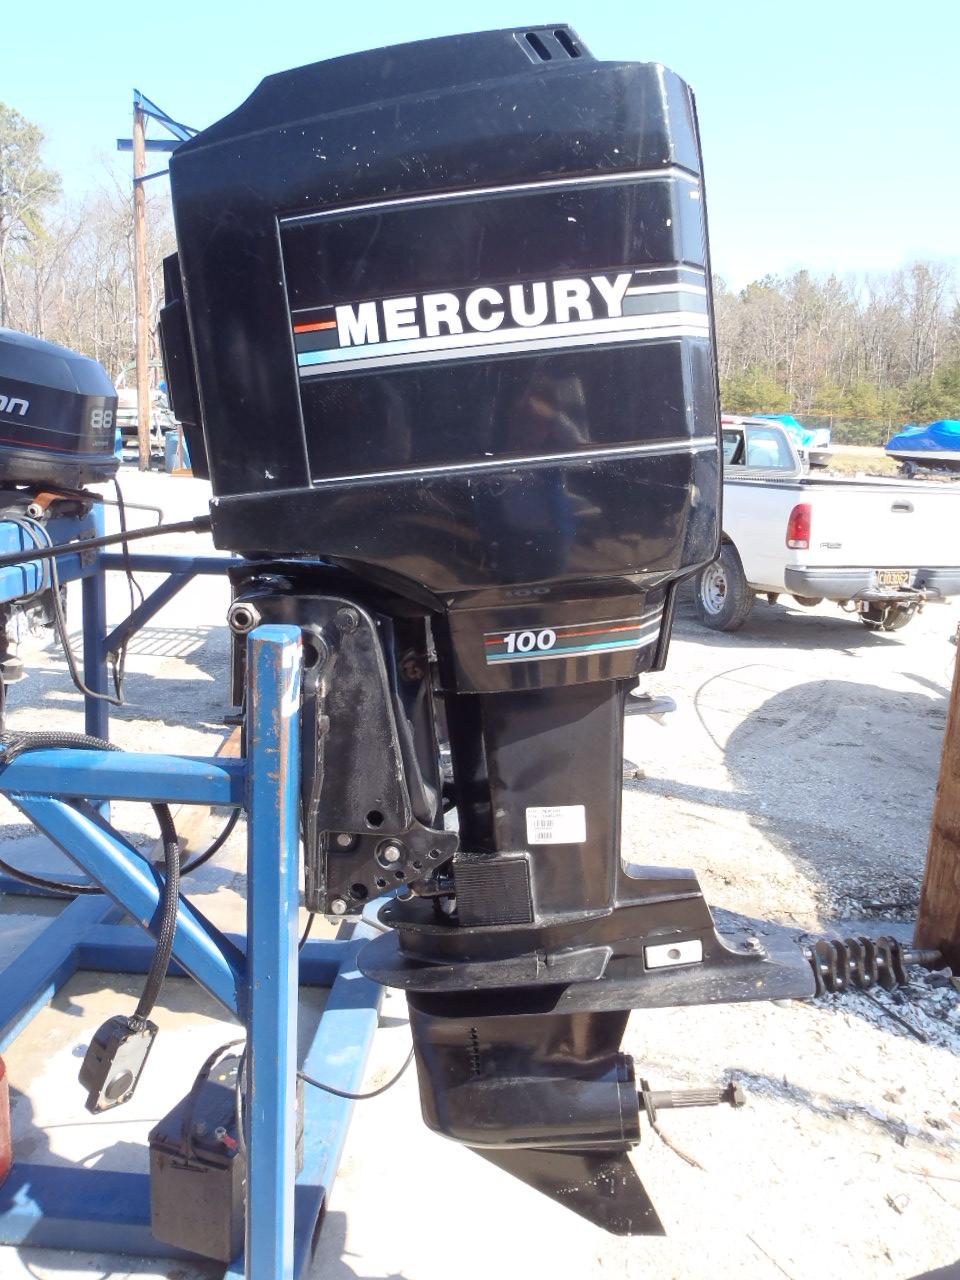 1993 Used Mercury 100elpto 100hp 2 Stroke Remote Outboard